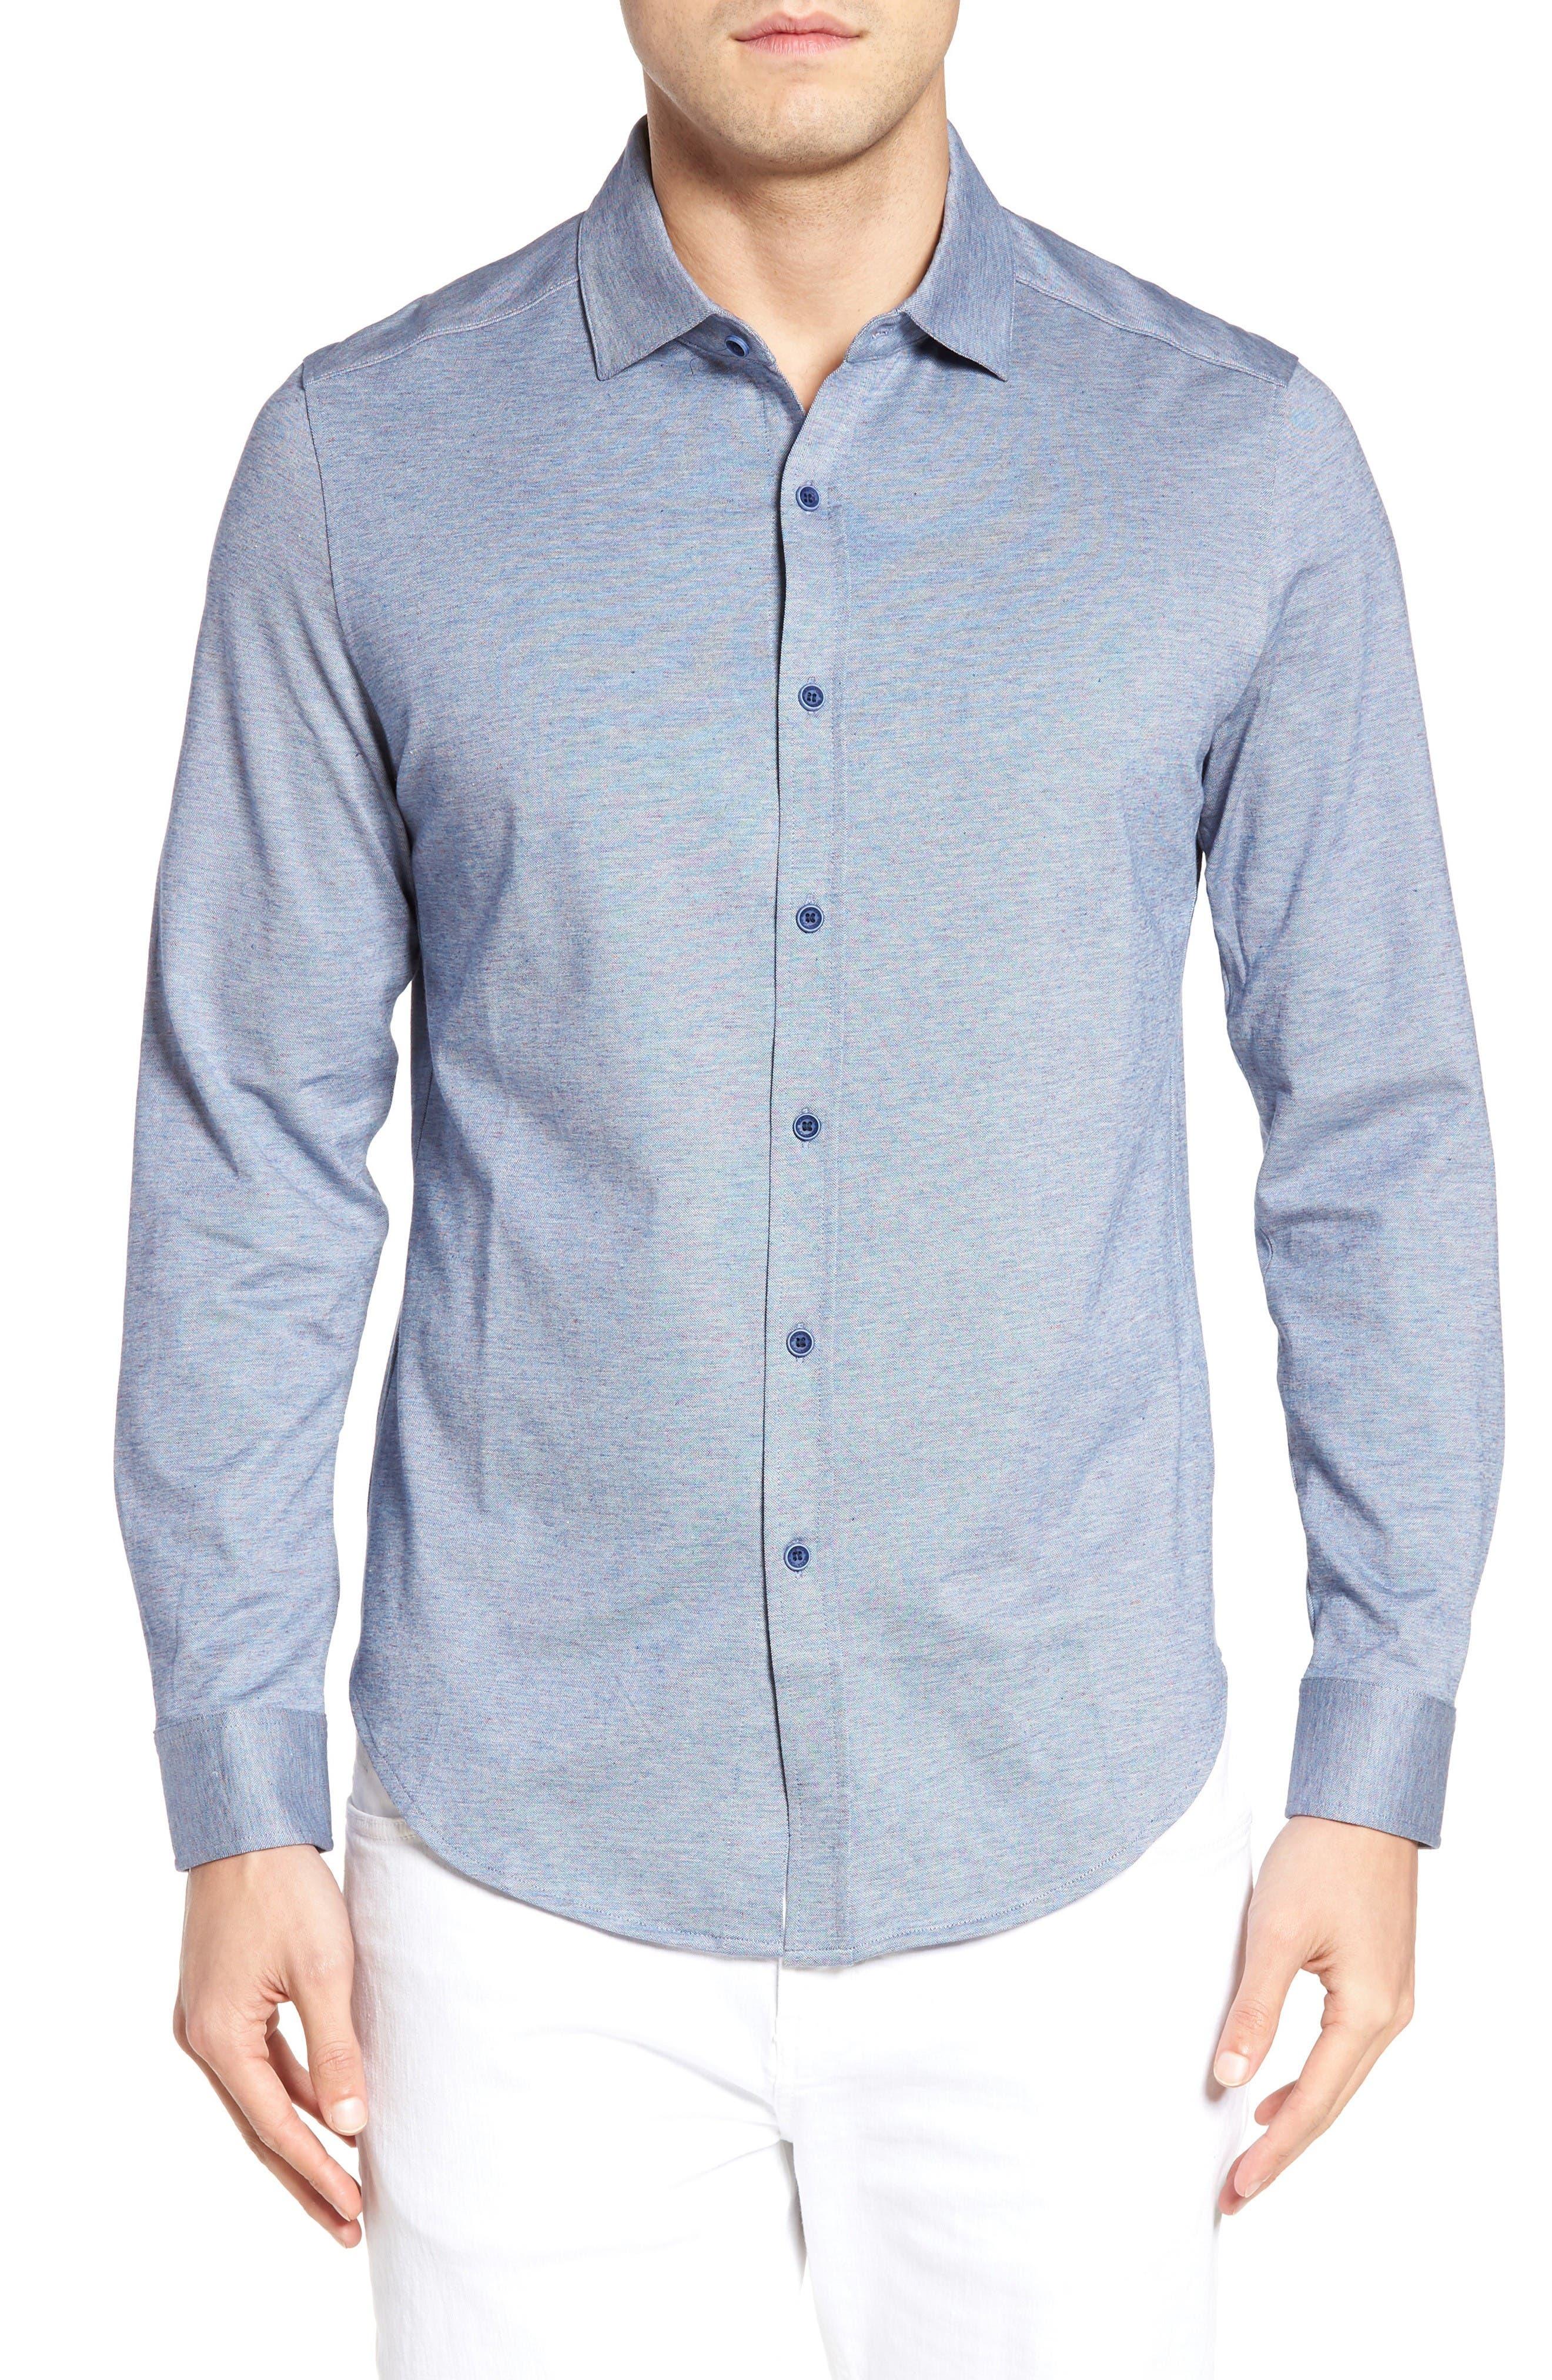 Alternate Image 1 Selected - Bugatchi Shaped Fit Knit Sport Shirt